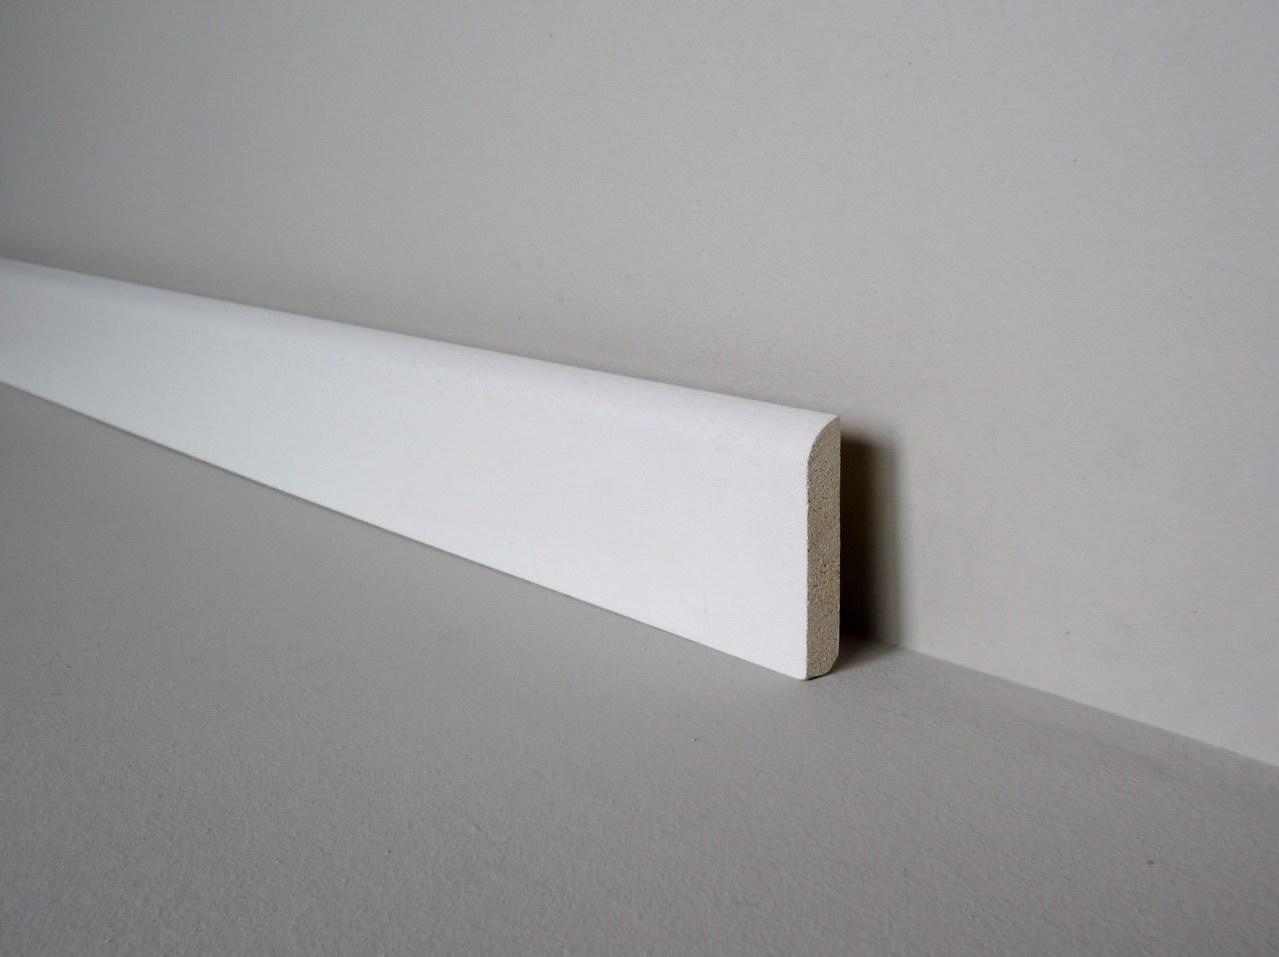 Sockelleisten Weiß Holz sockelleisten holz weiß ih02 hitoiro